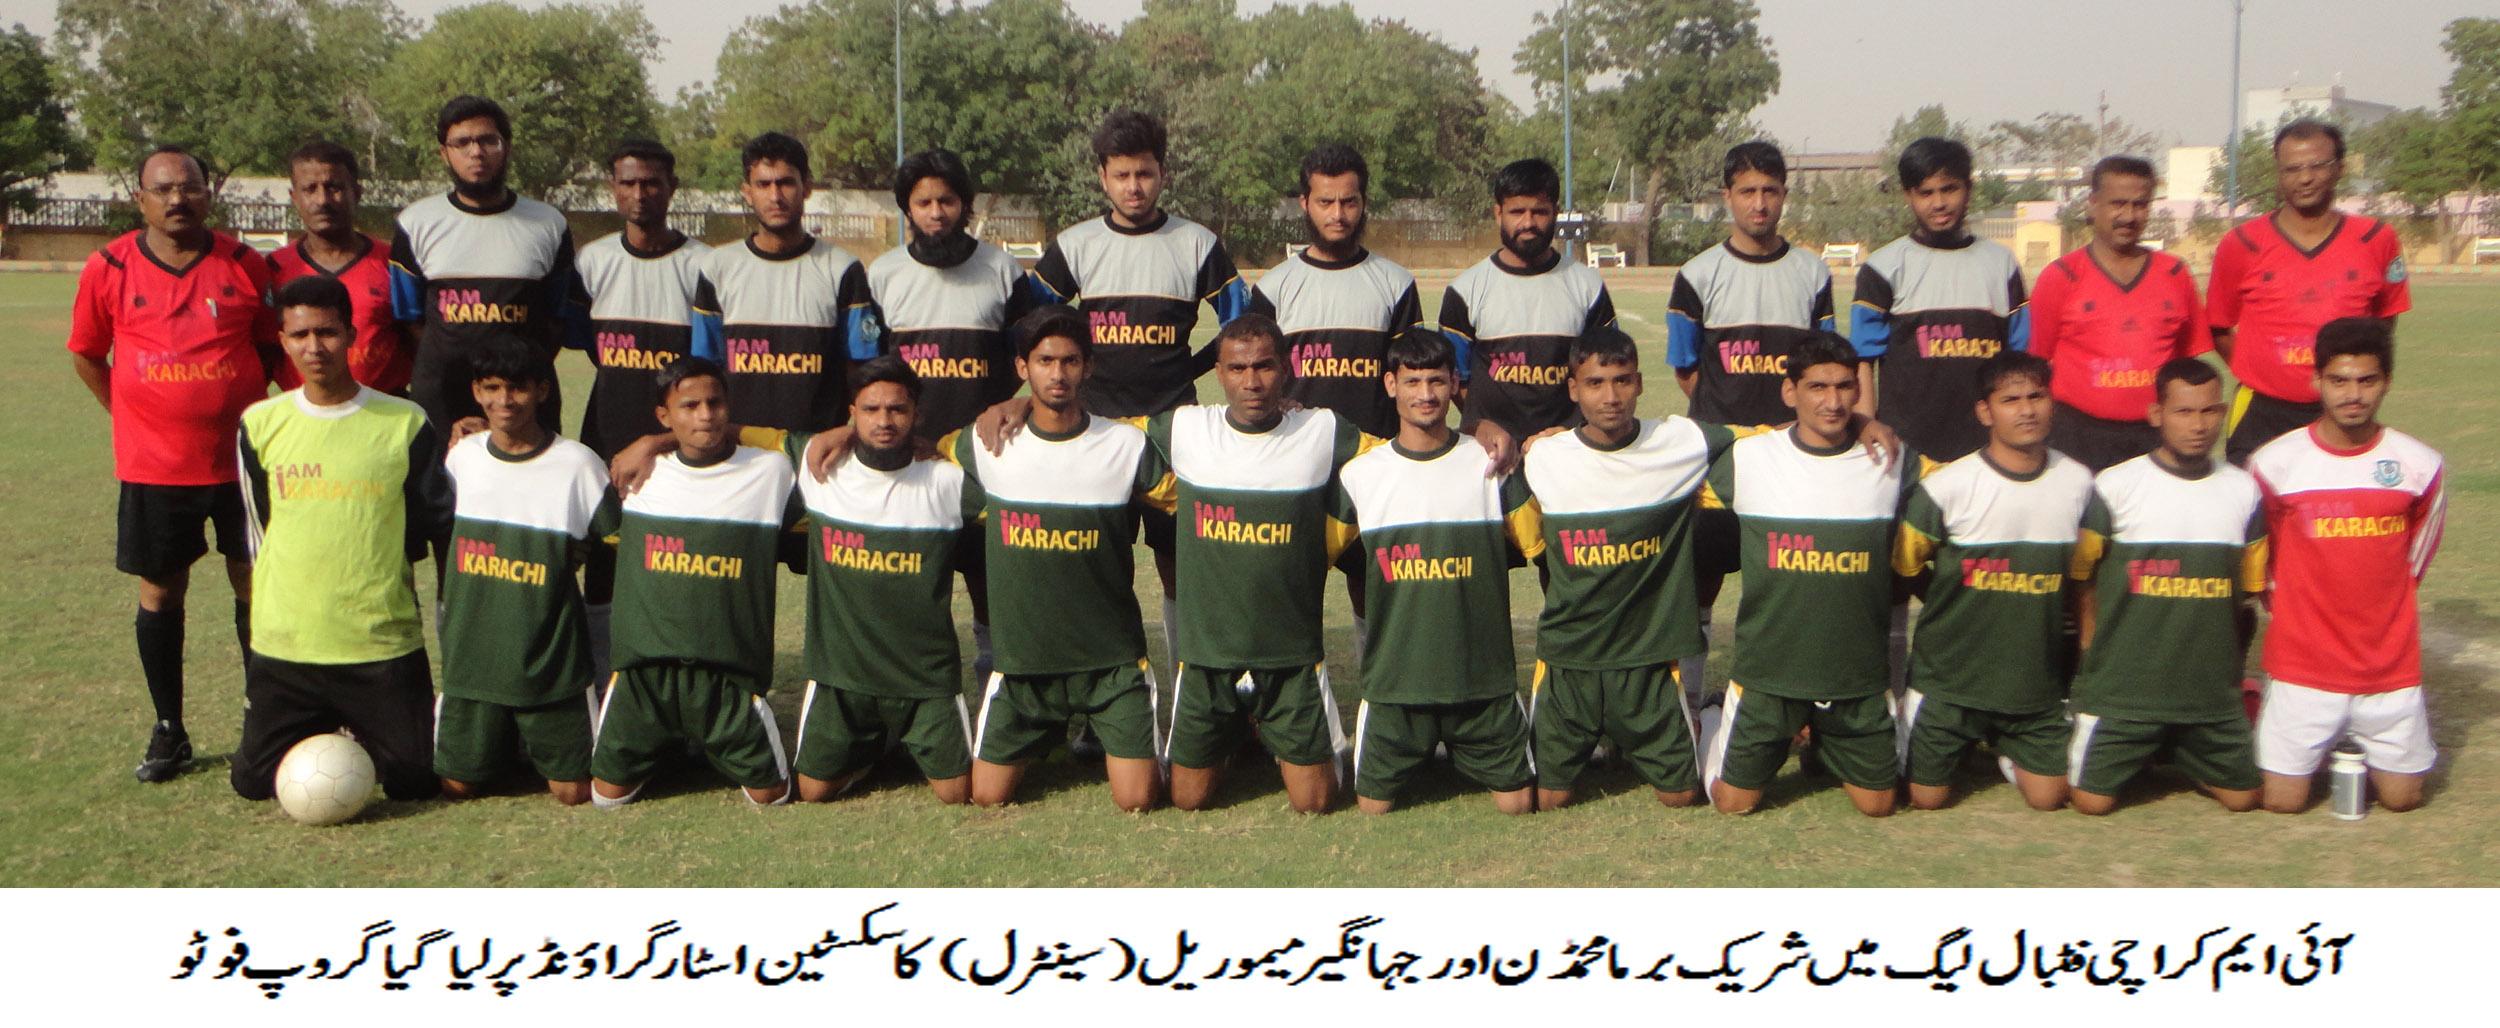 Karachi Football League: Burma Mohammadan grab win, Azam Sports and Irfan Memorial share points